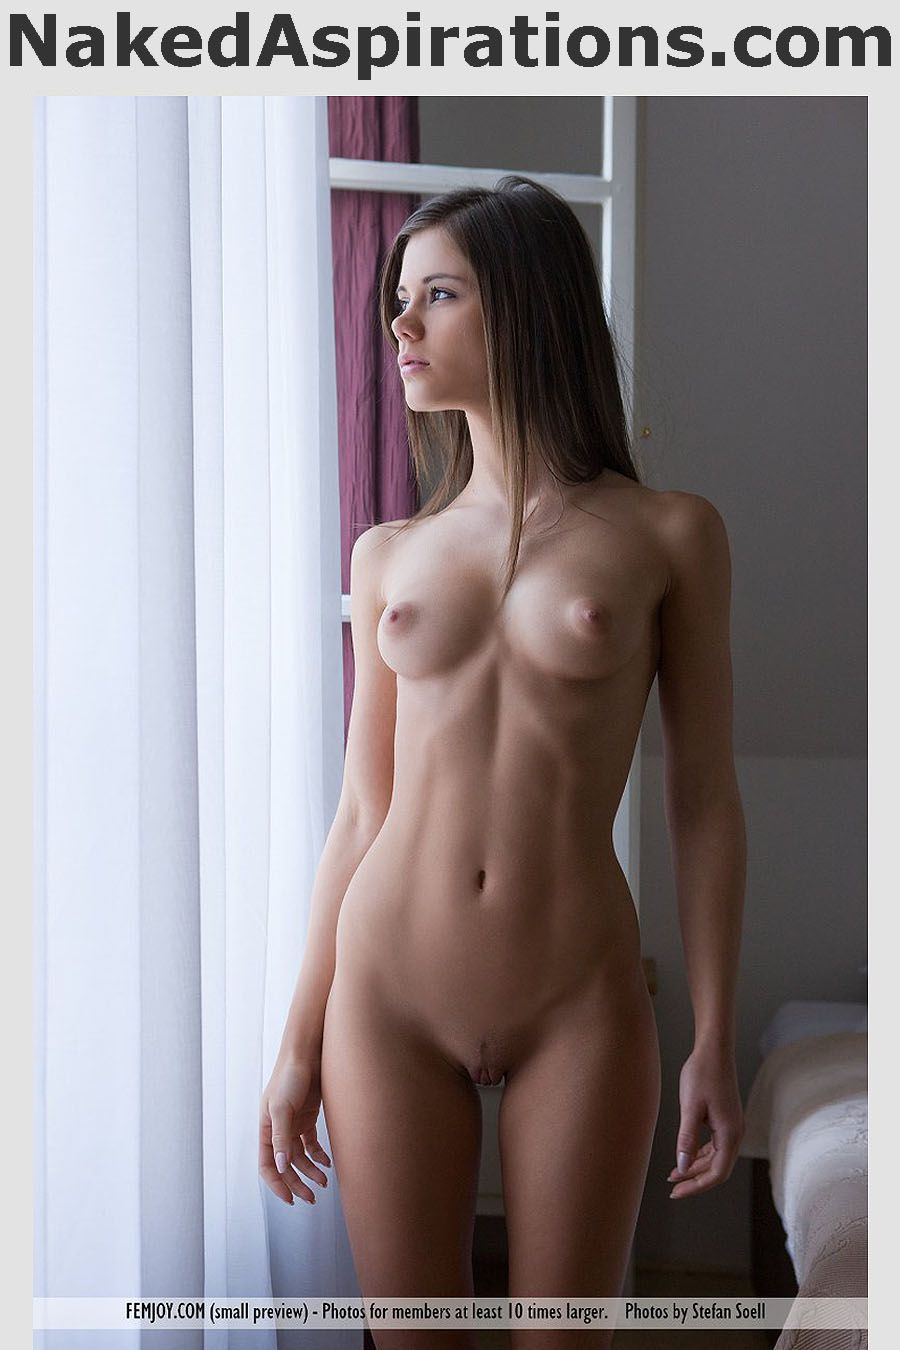 12 best nude figures images on pinterest | figure drawings, figure